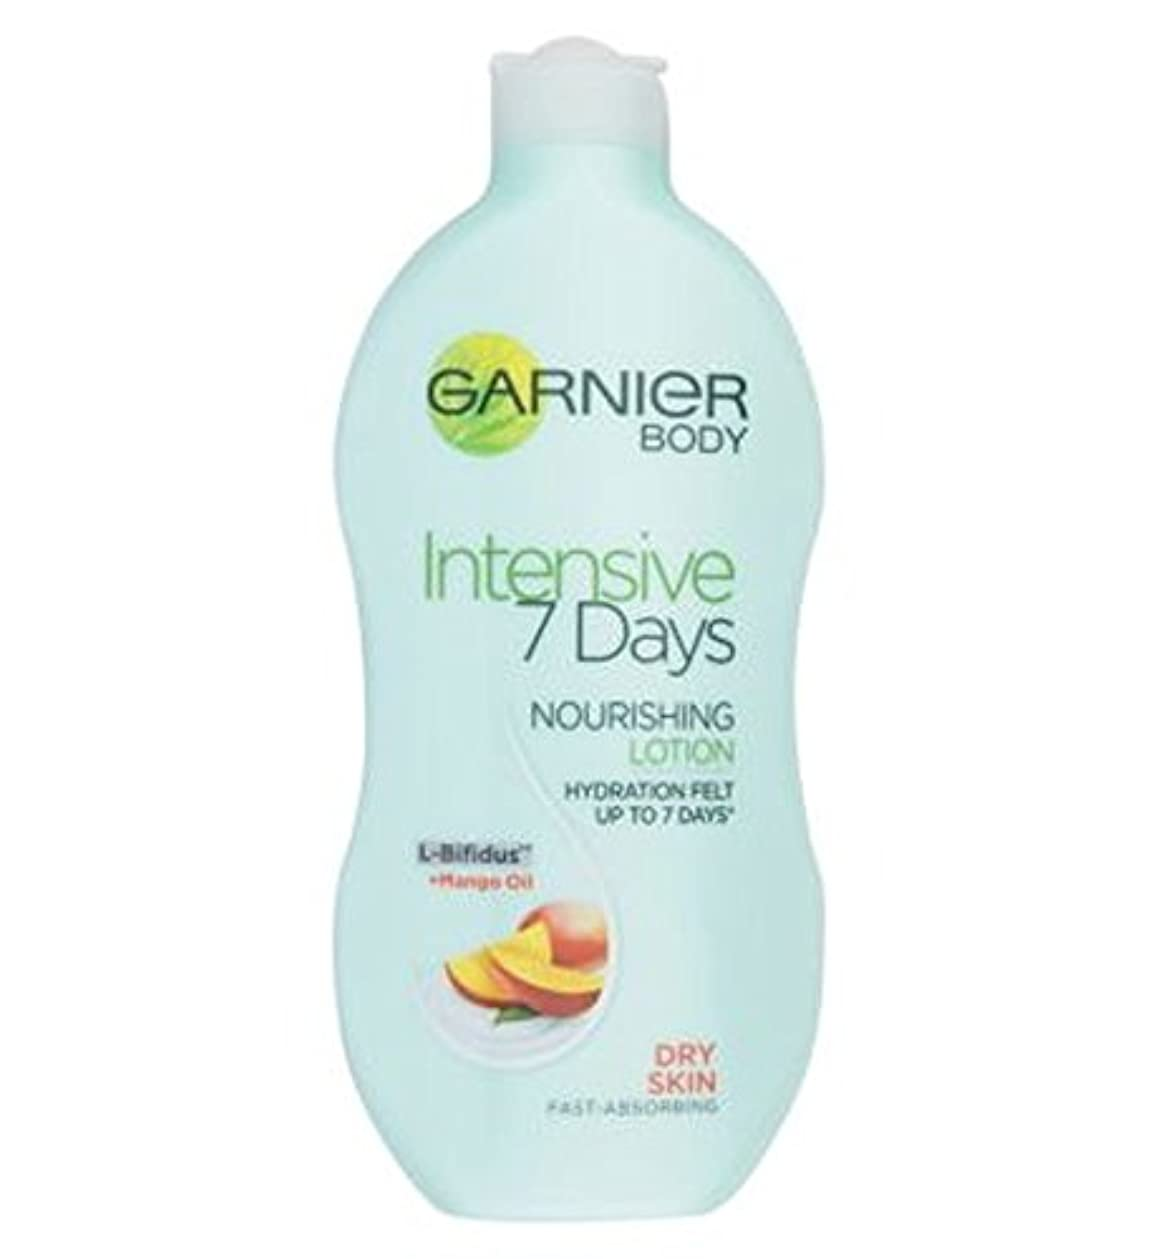 Garnier Intensive 7 Days Daily Body Lotion with nourishing Mango Oil for Dry Skin 400ml - 乾燥肌の400ミリリットルのための栄養マンゴーオイル...